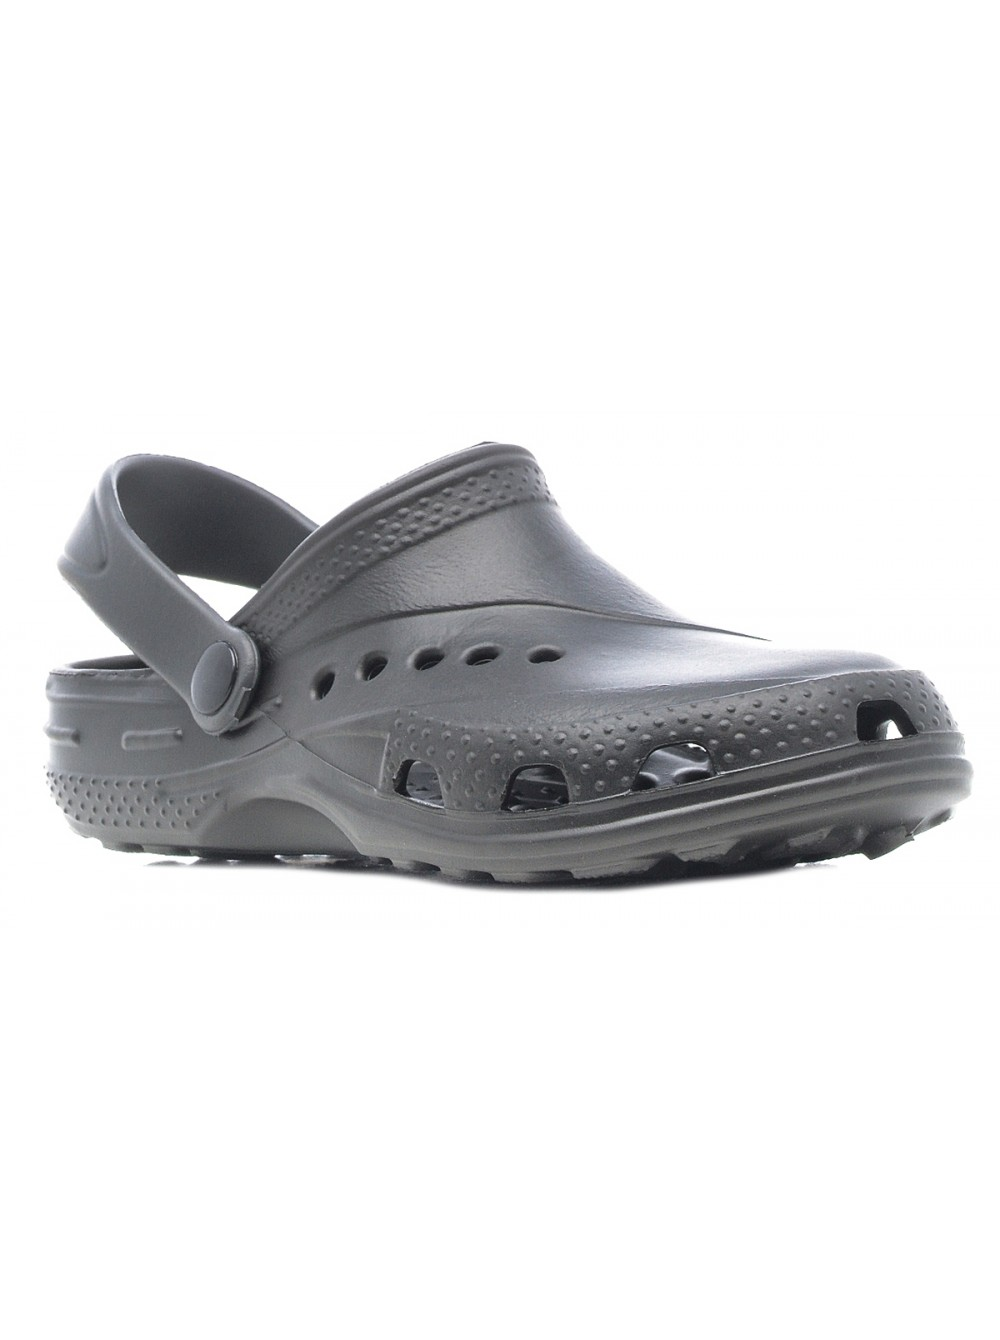 Кроксы Дюна 601/06 черный/серый (35-42)